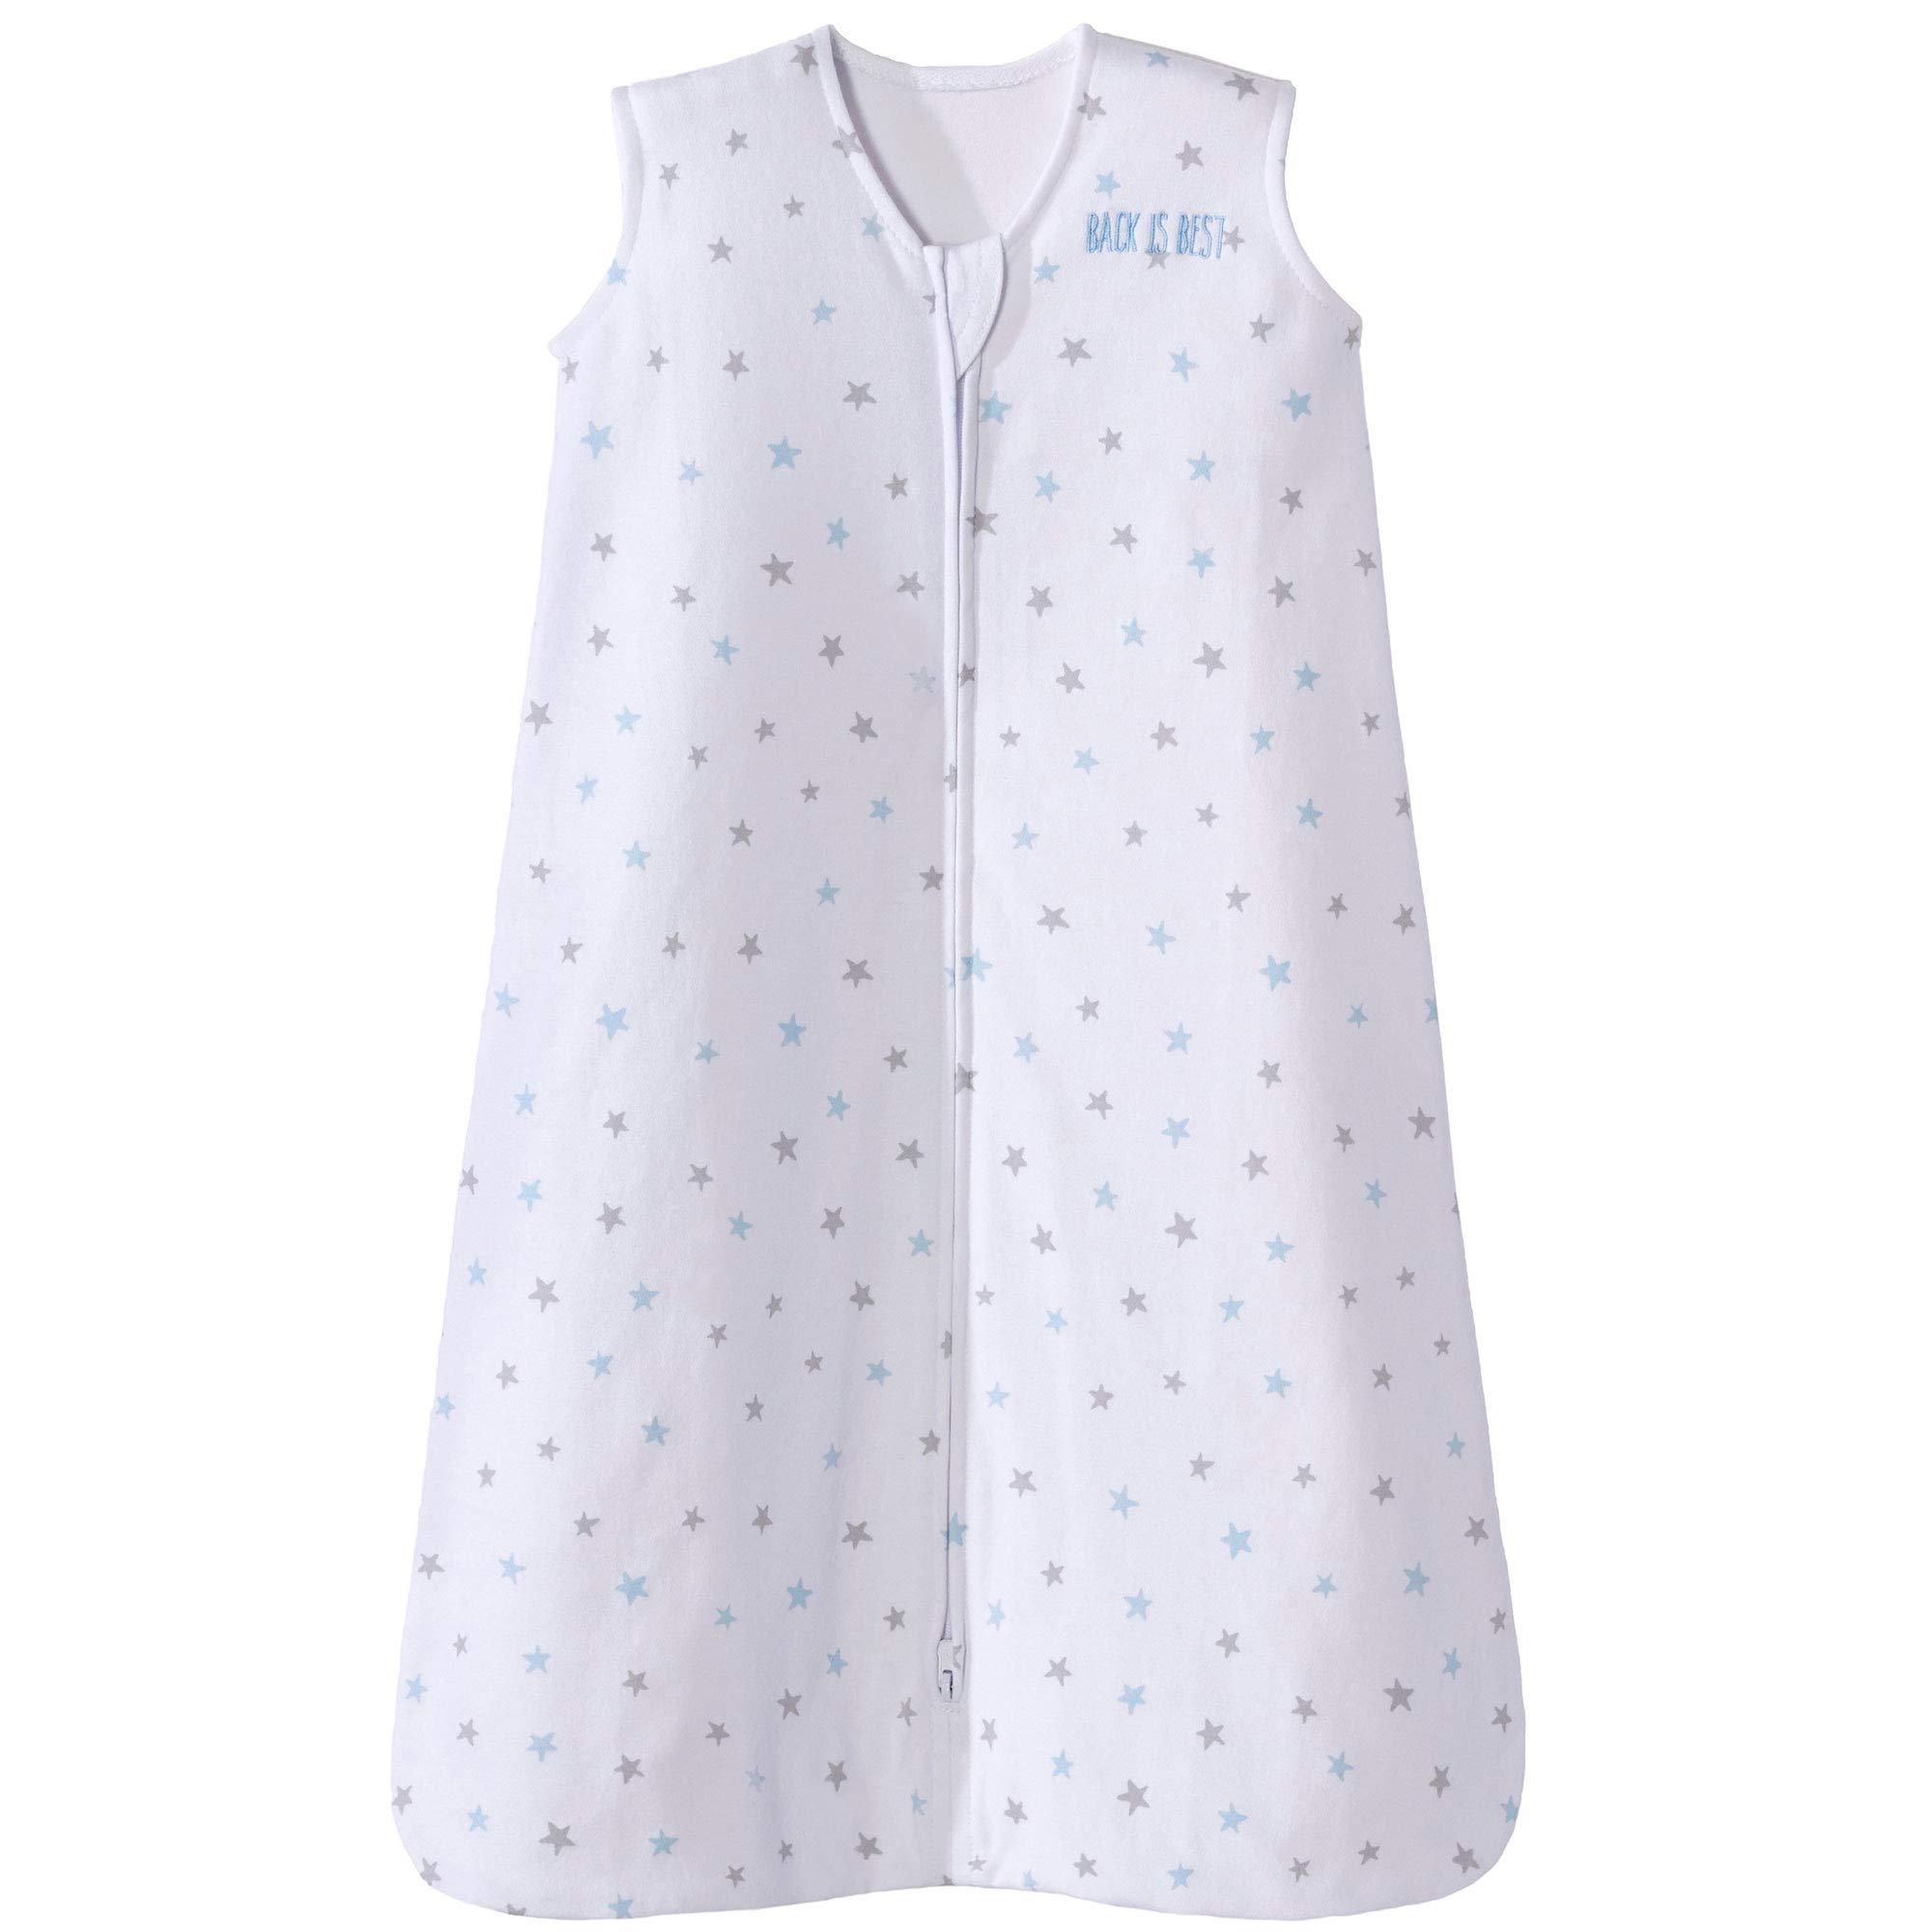 Halo Sleepsack Cotton Wearable Blanket, Blue Stars, Large